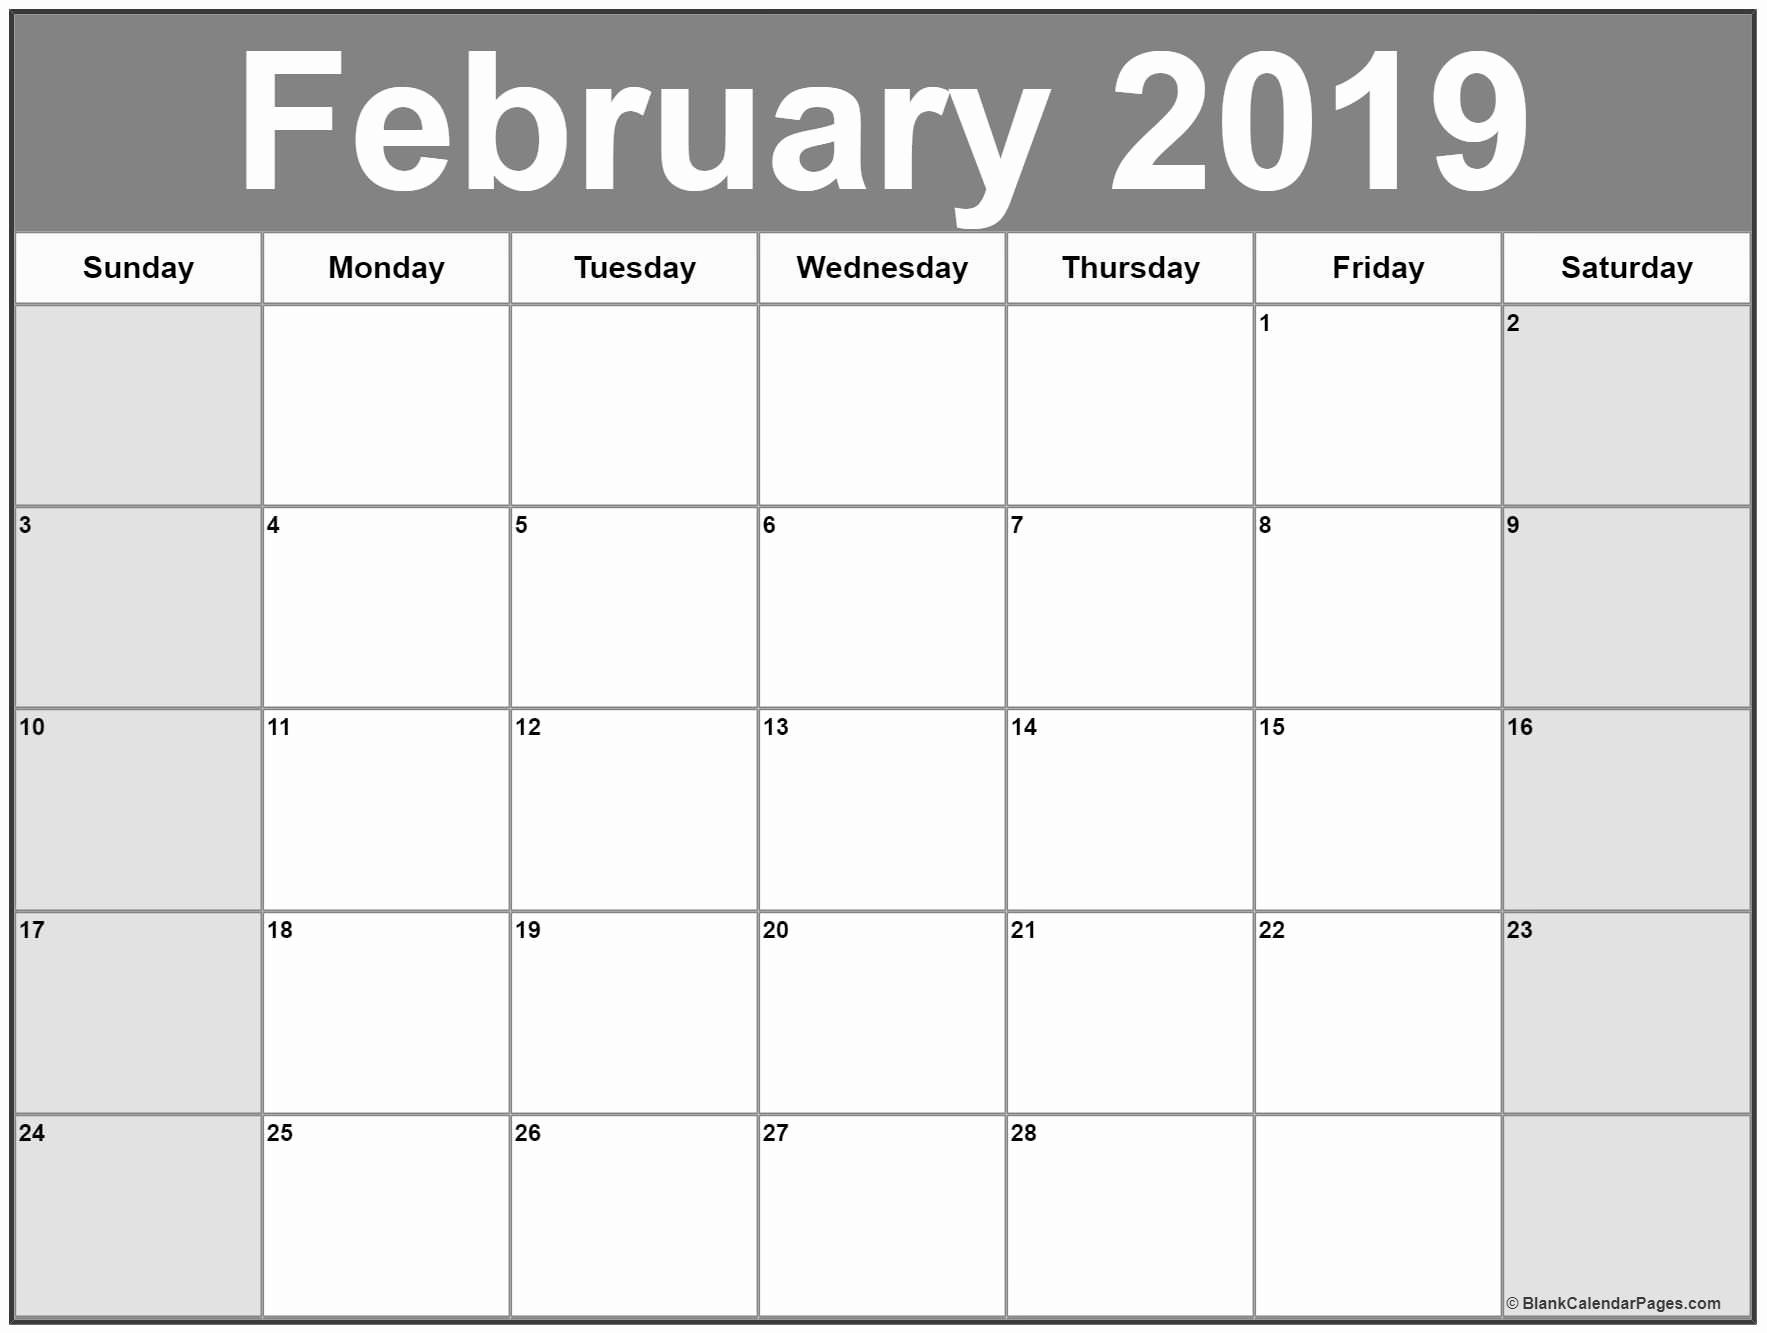 February 2019 Calendar Template Word